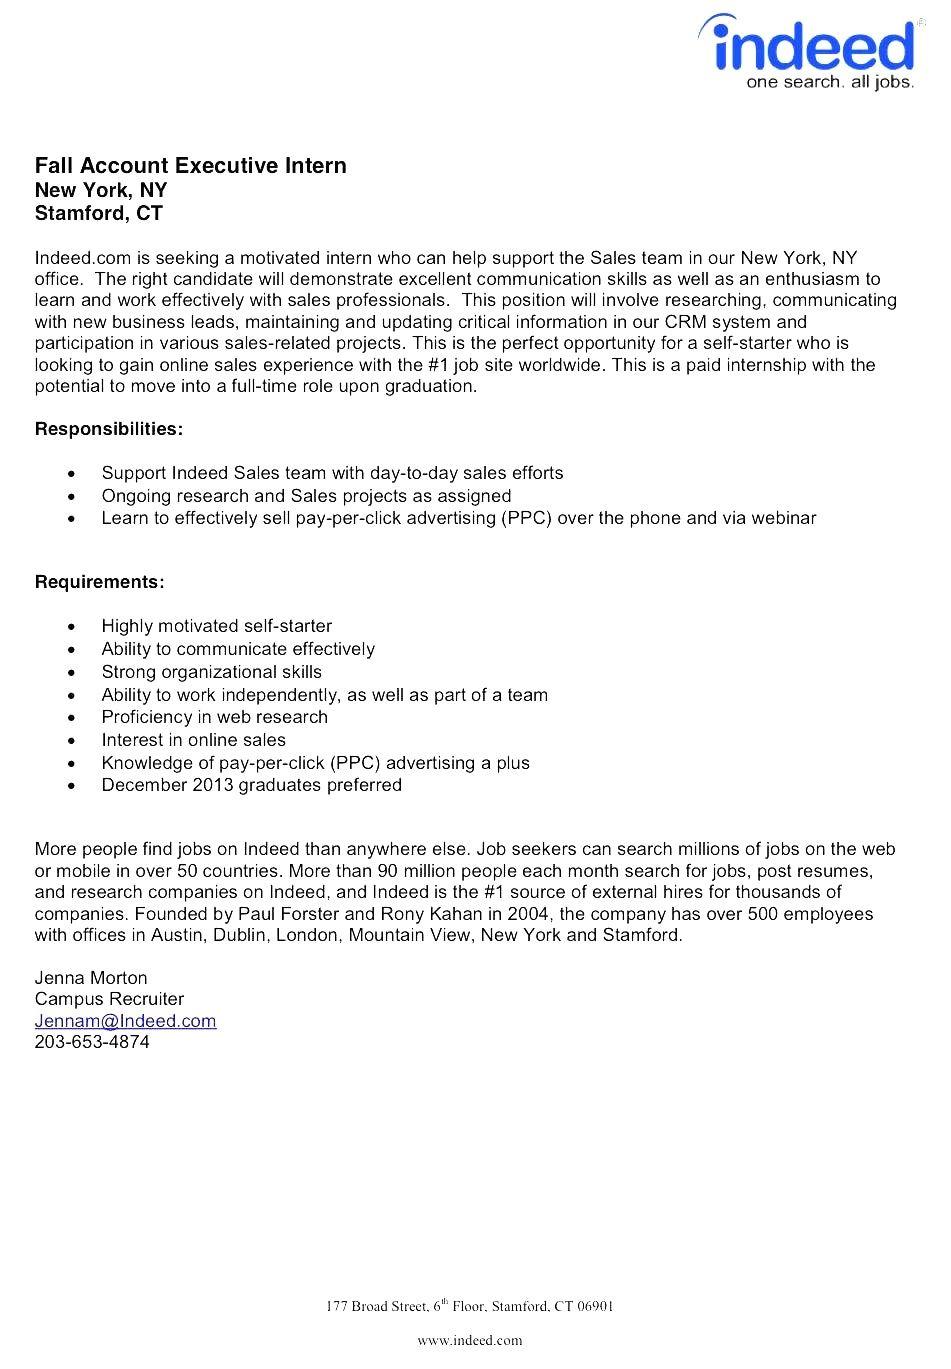 free resume templates indeed freeresumetemplates indeed resume